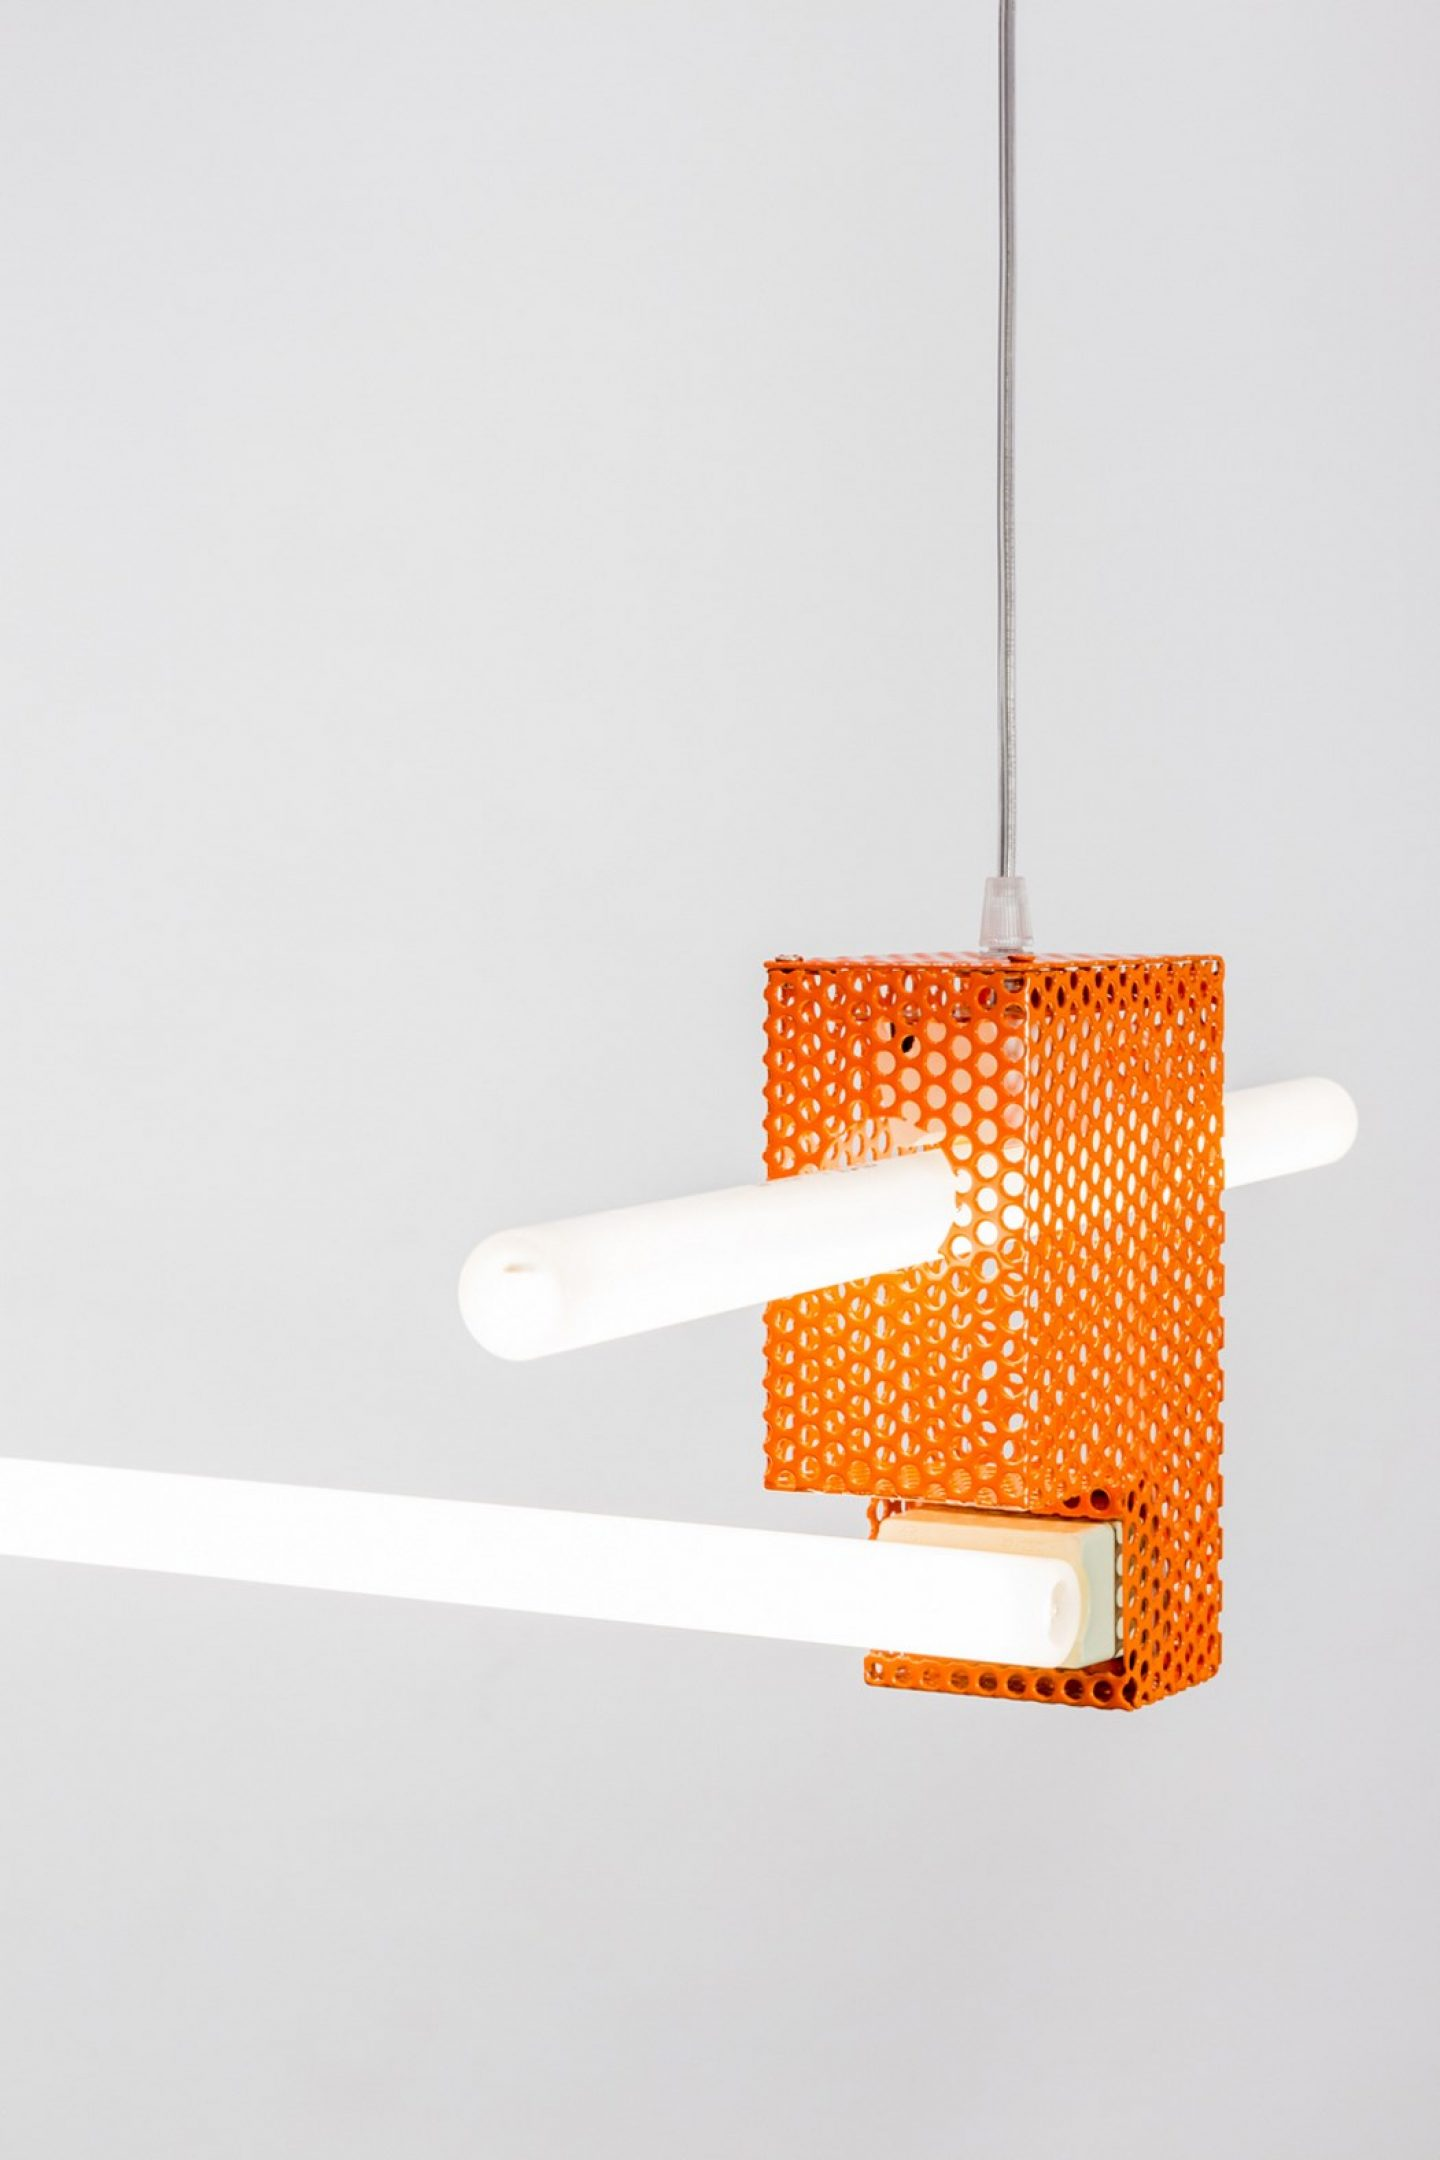 Marta_Ayla_Design (11)